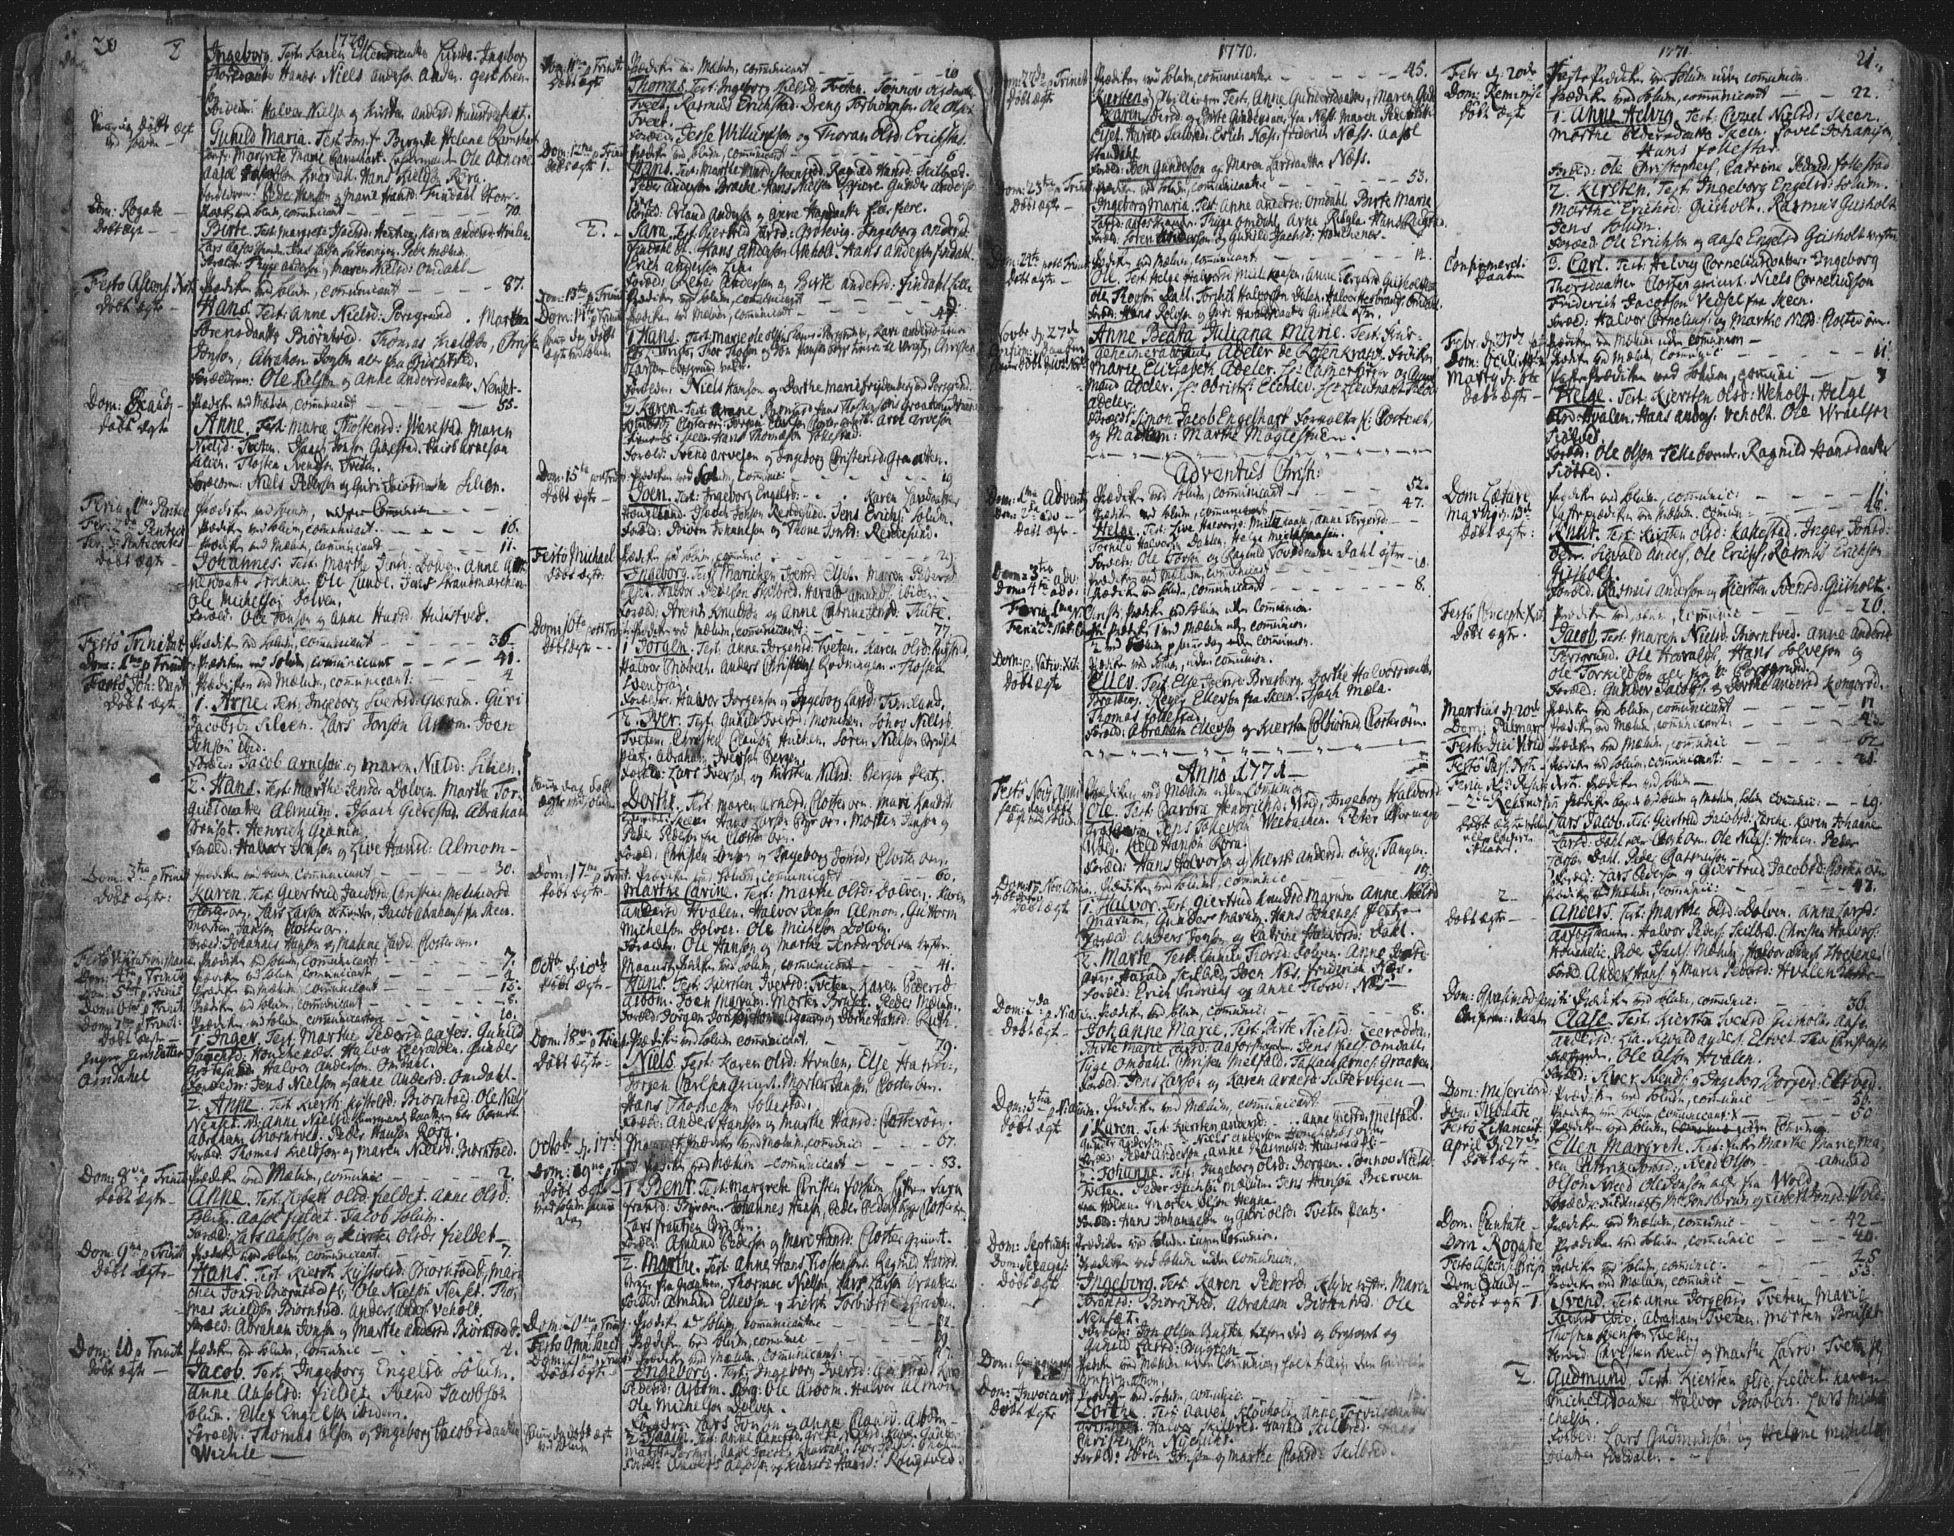 SAKO, Solum kirkebøker, F/Fa/L0003: Ministerialbok nr. I 3, 1761-1814, s. 20-21